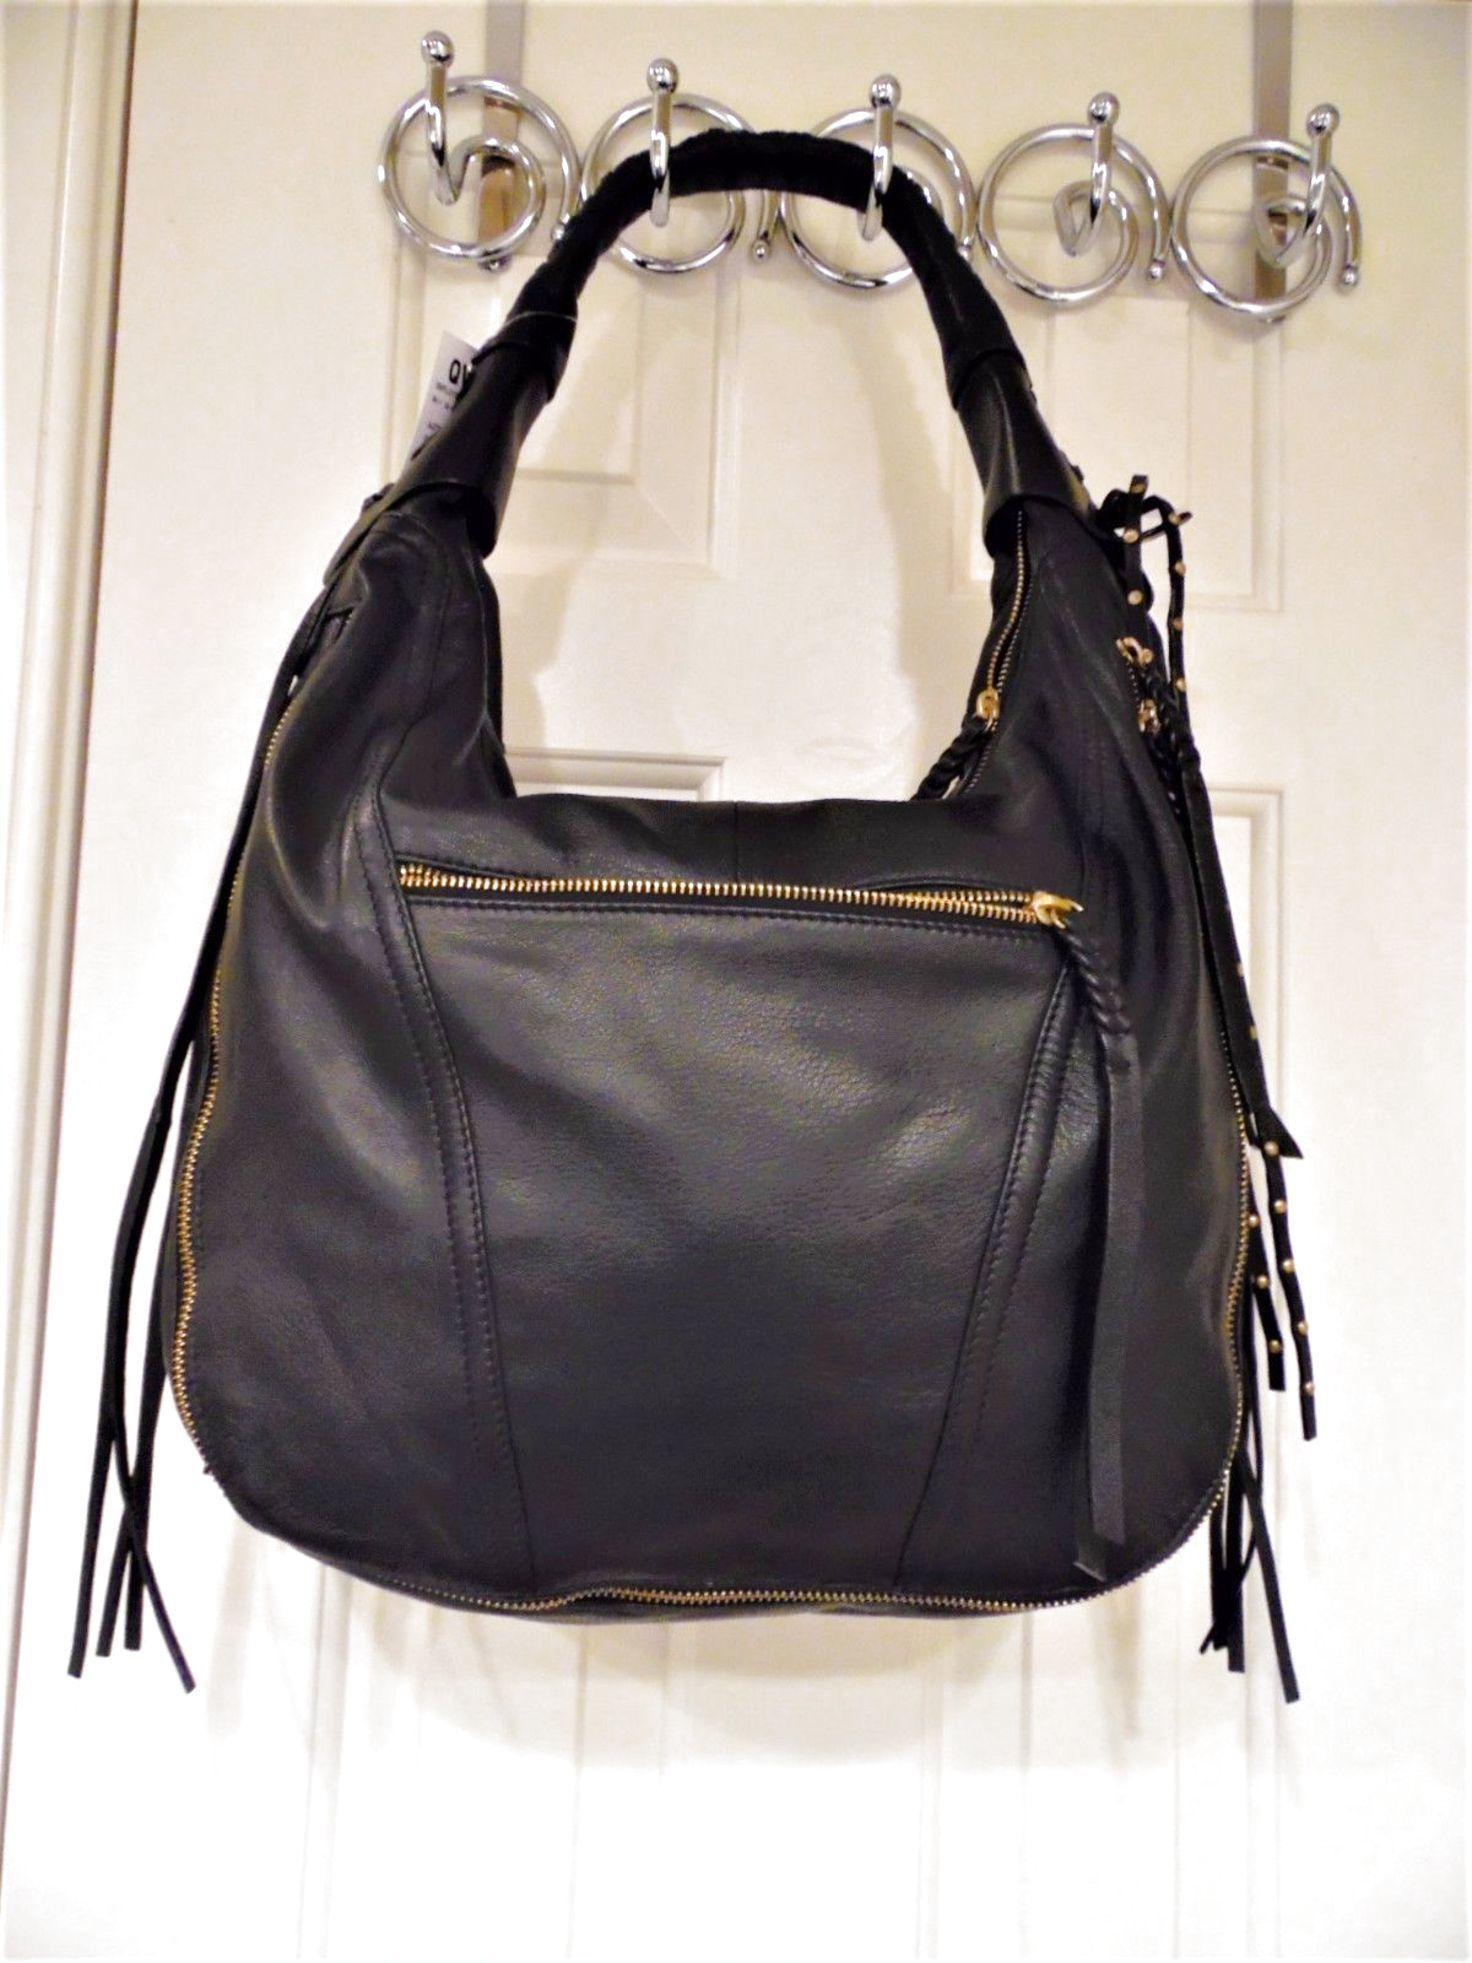 3a4802f51f orYANY Soft Nappa Leather MICHELLE Purse Handbag Hobo QVC   A270292 Black  NWT  114.99